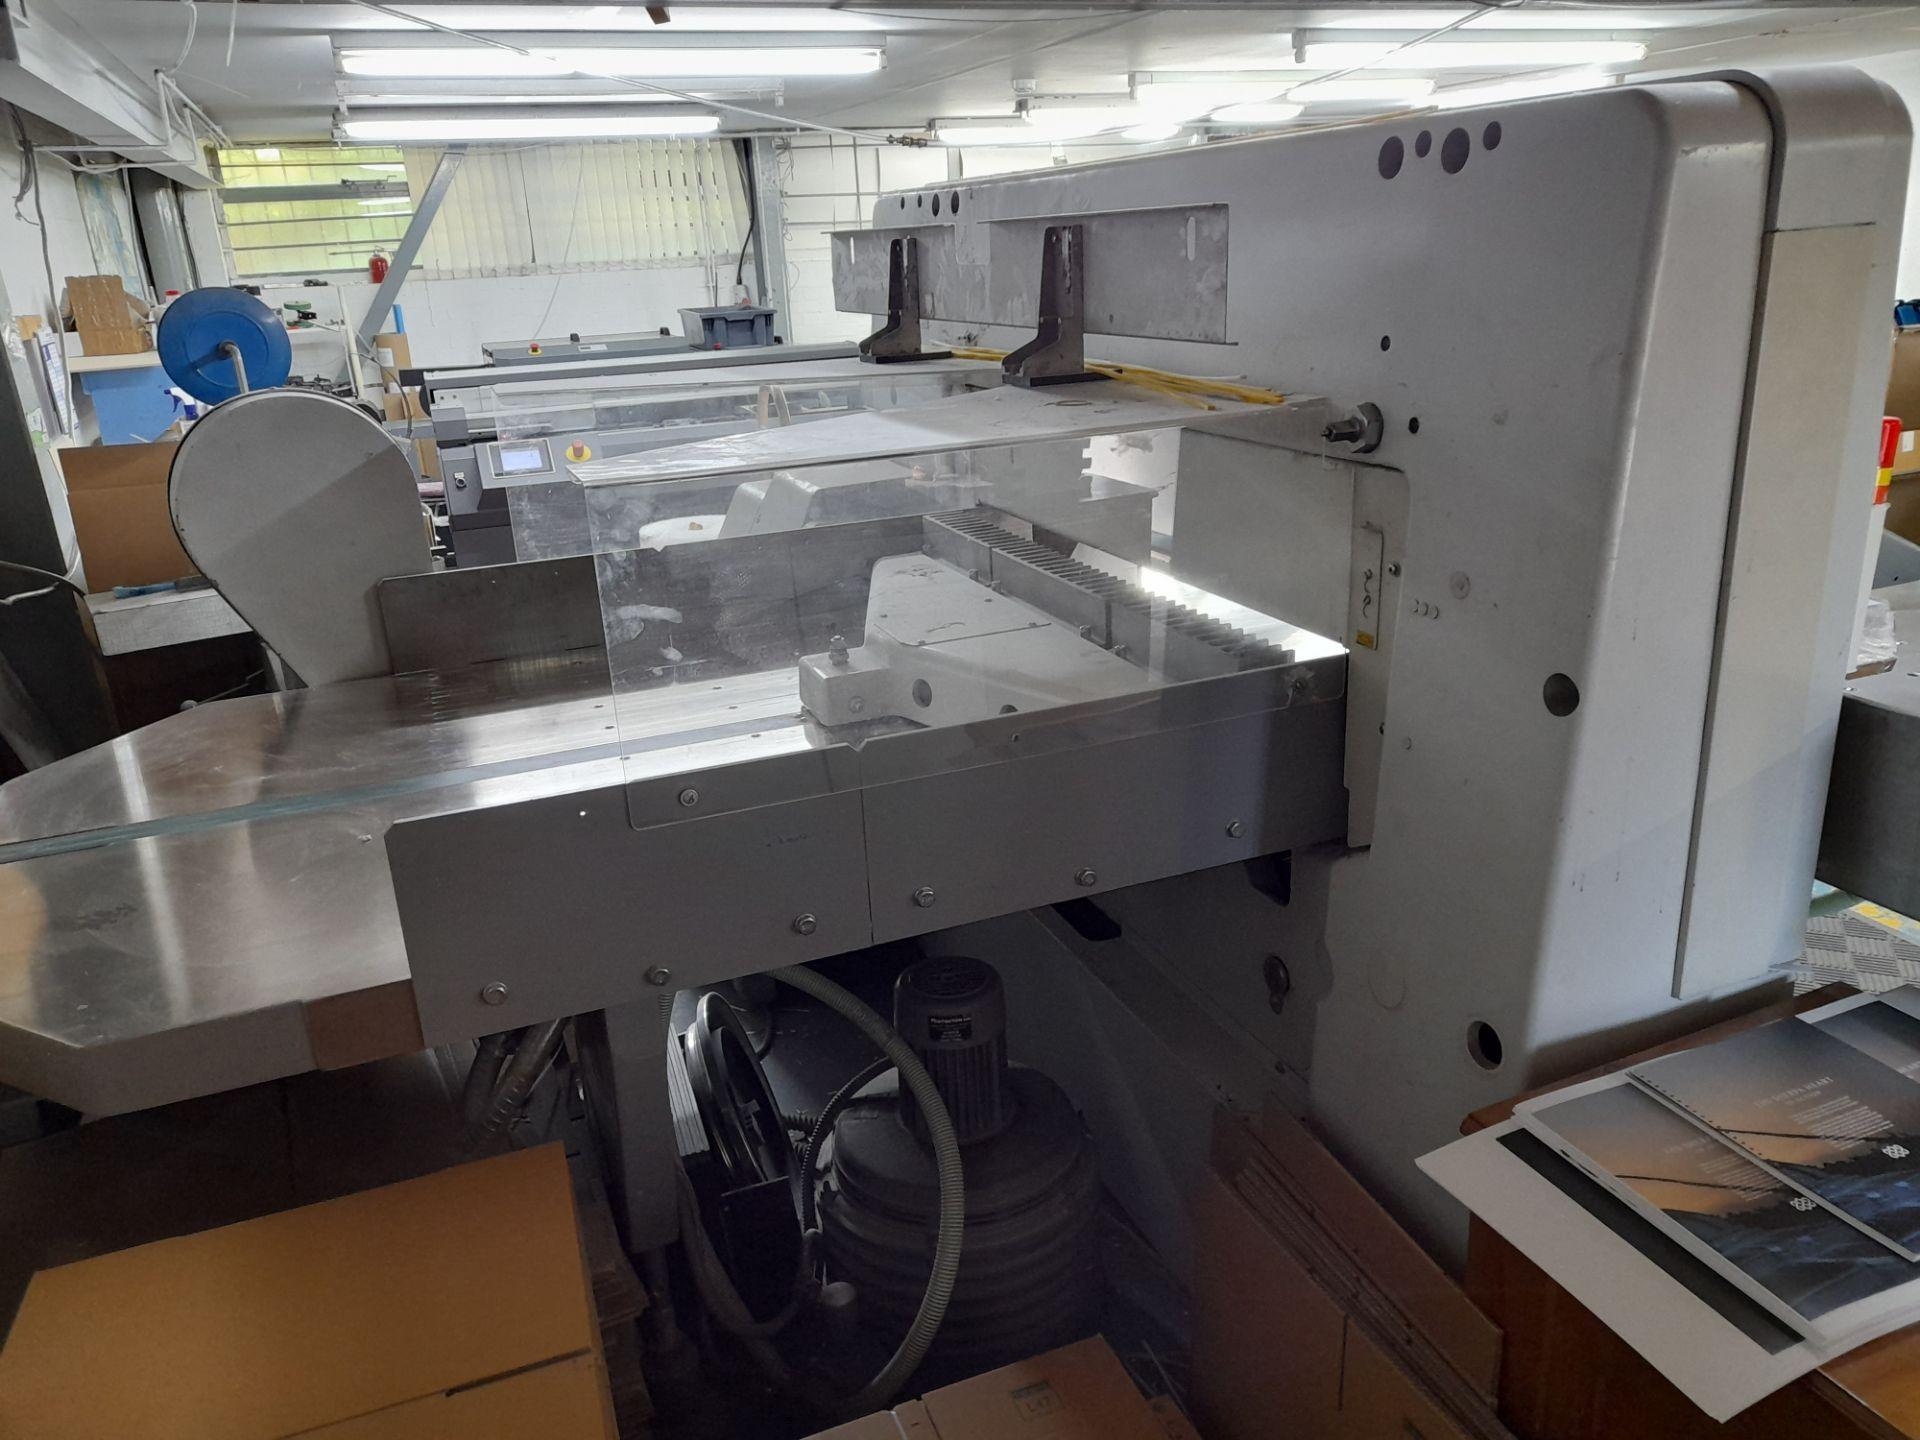 Polar Mohr 115 ED guillotine, Machine Number: 7031 - Image 5 of 9